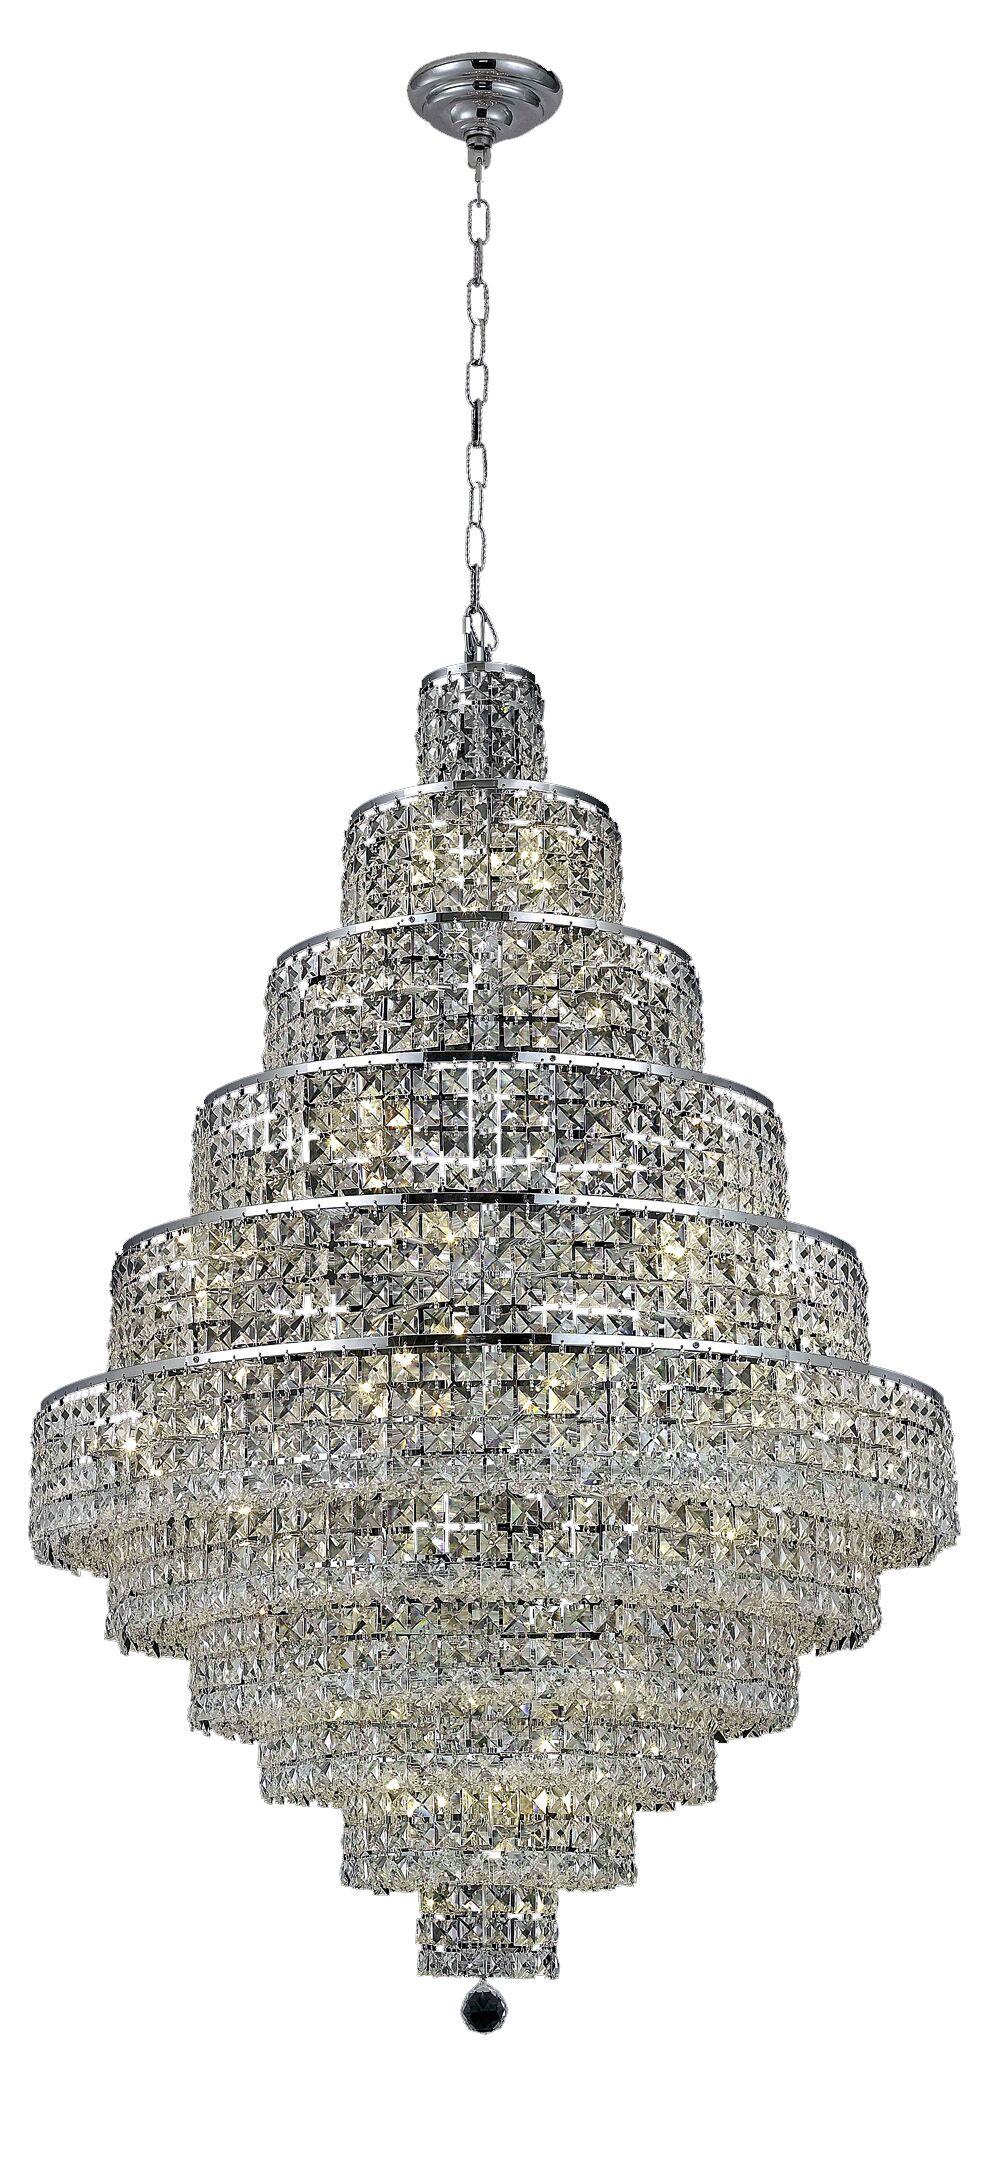 Bratton Contemporary 30-Light Chandelier Crystal Color / Crystal Trim: Silver Shade (Grey) / Strass Swarovski